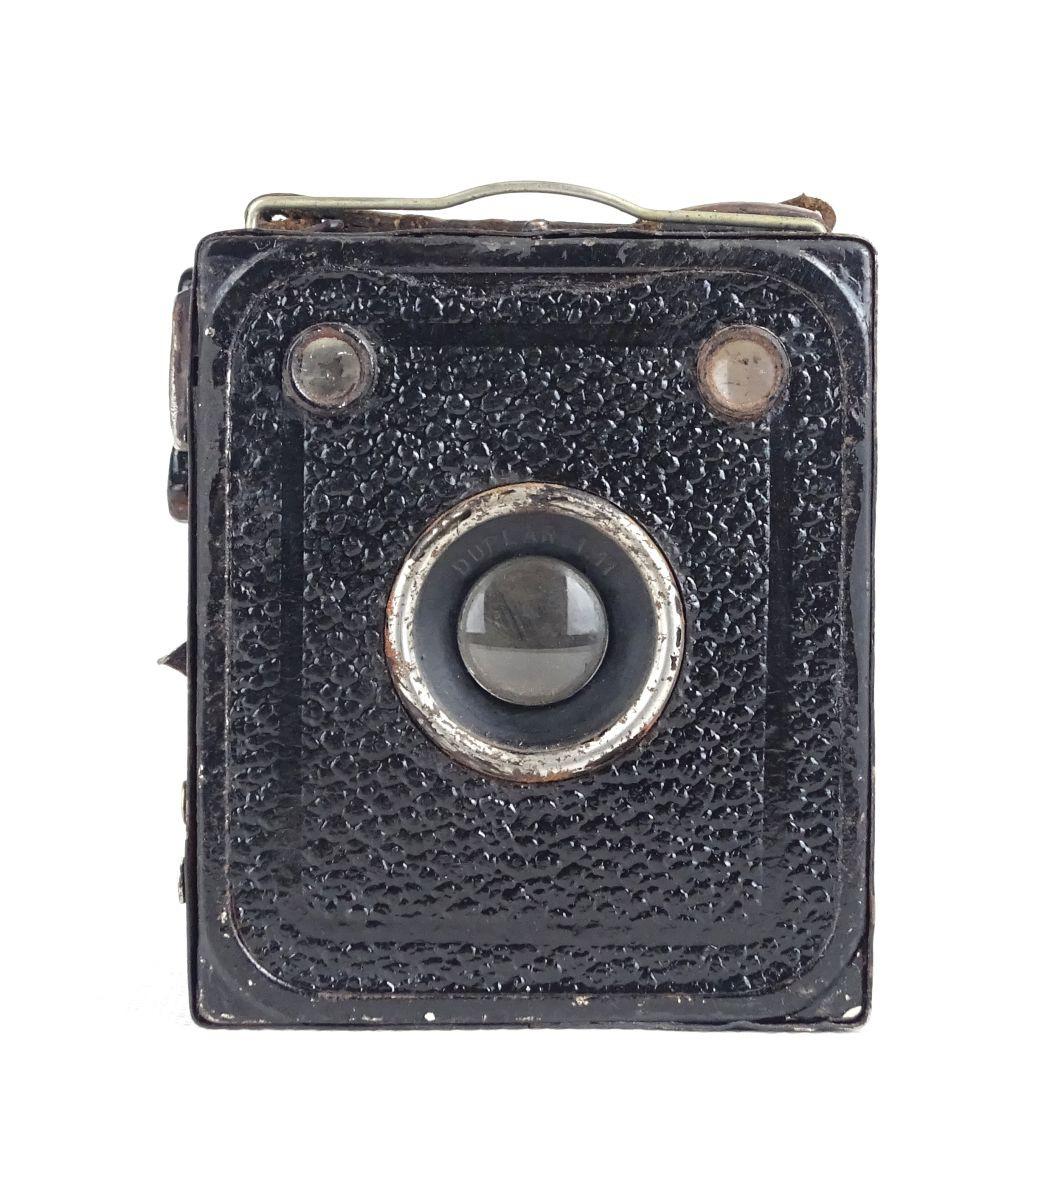 DSC03284.JPG (1057×1200)